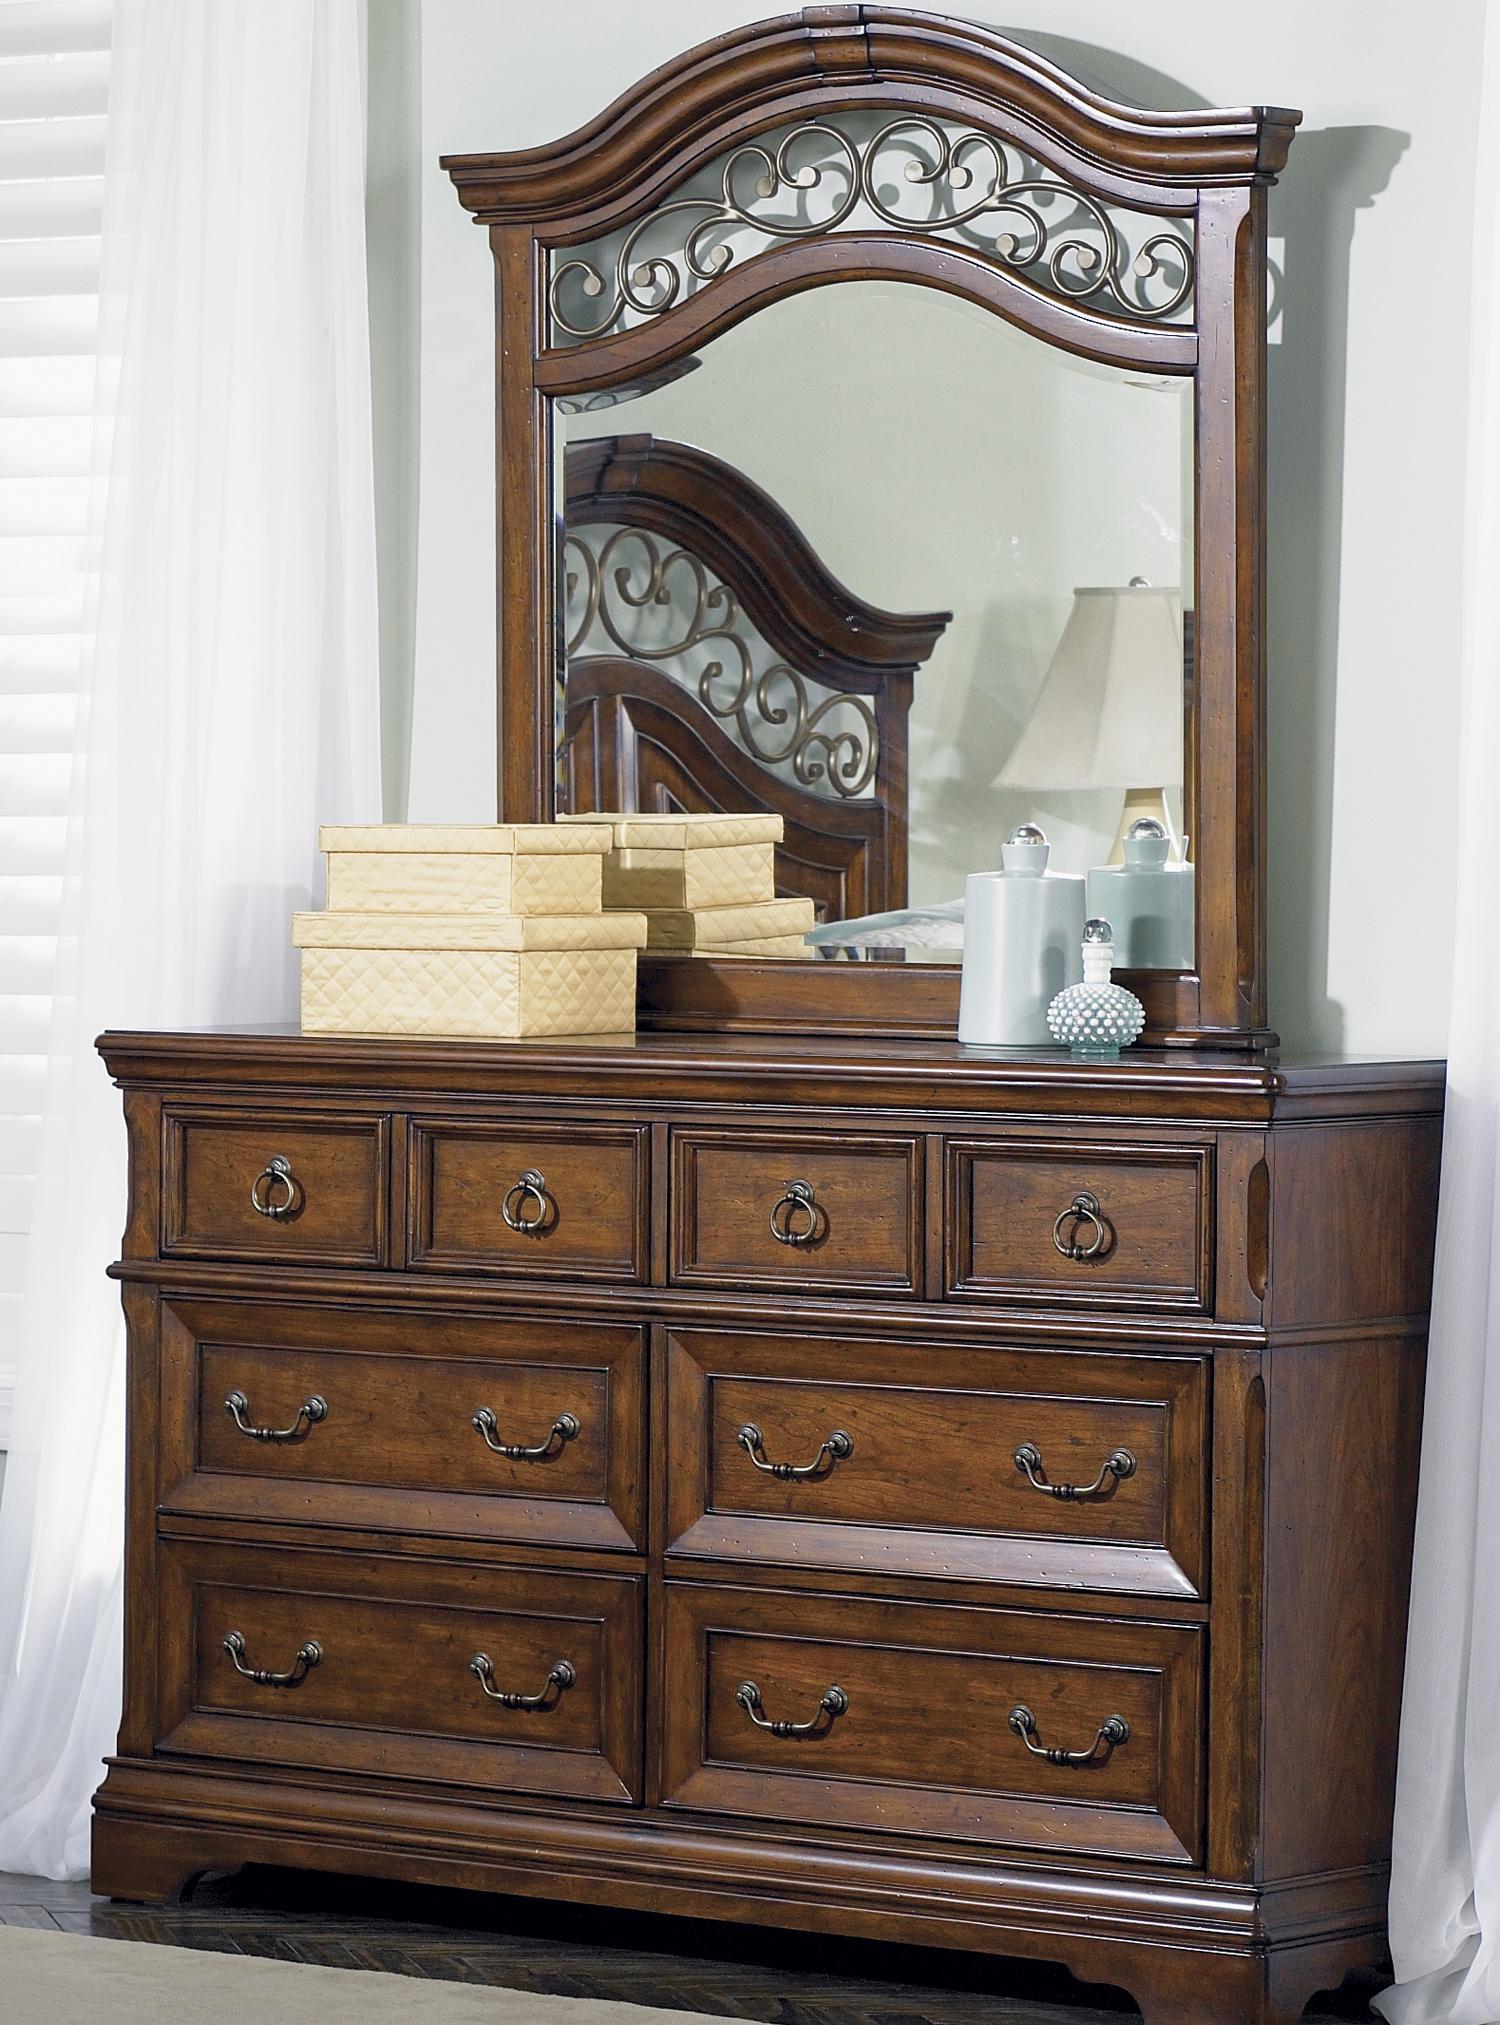 Liberty Furniture Laurelwood Dresser & Mirror - Item Number: 547-BR31+BR51